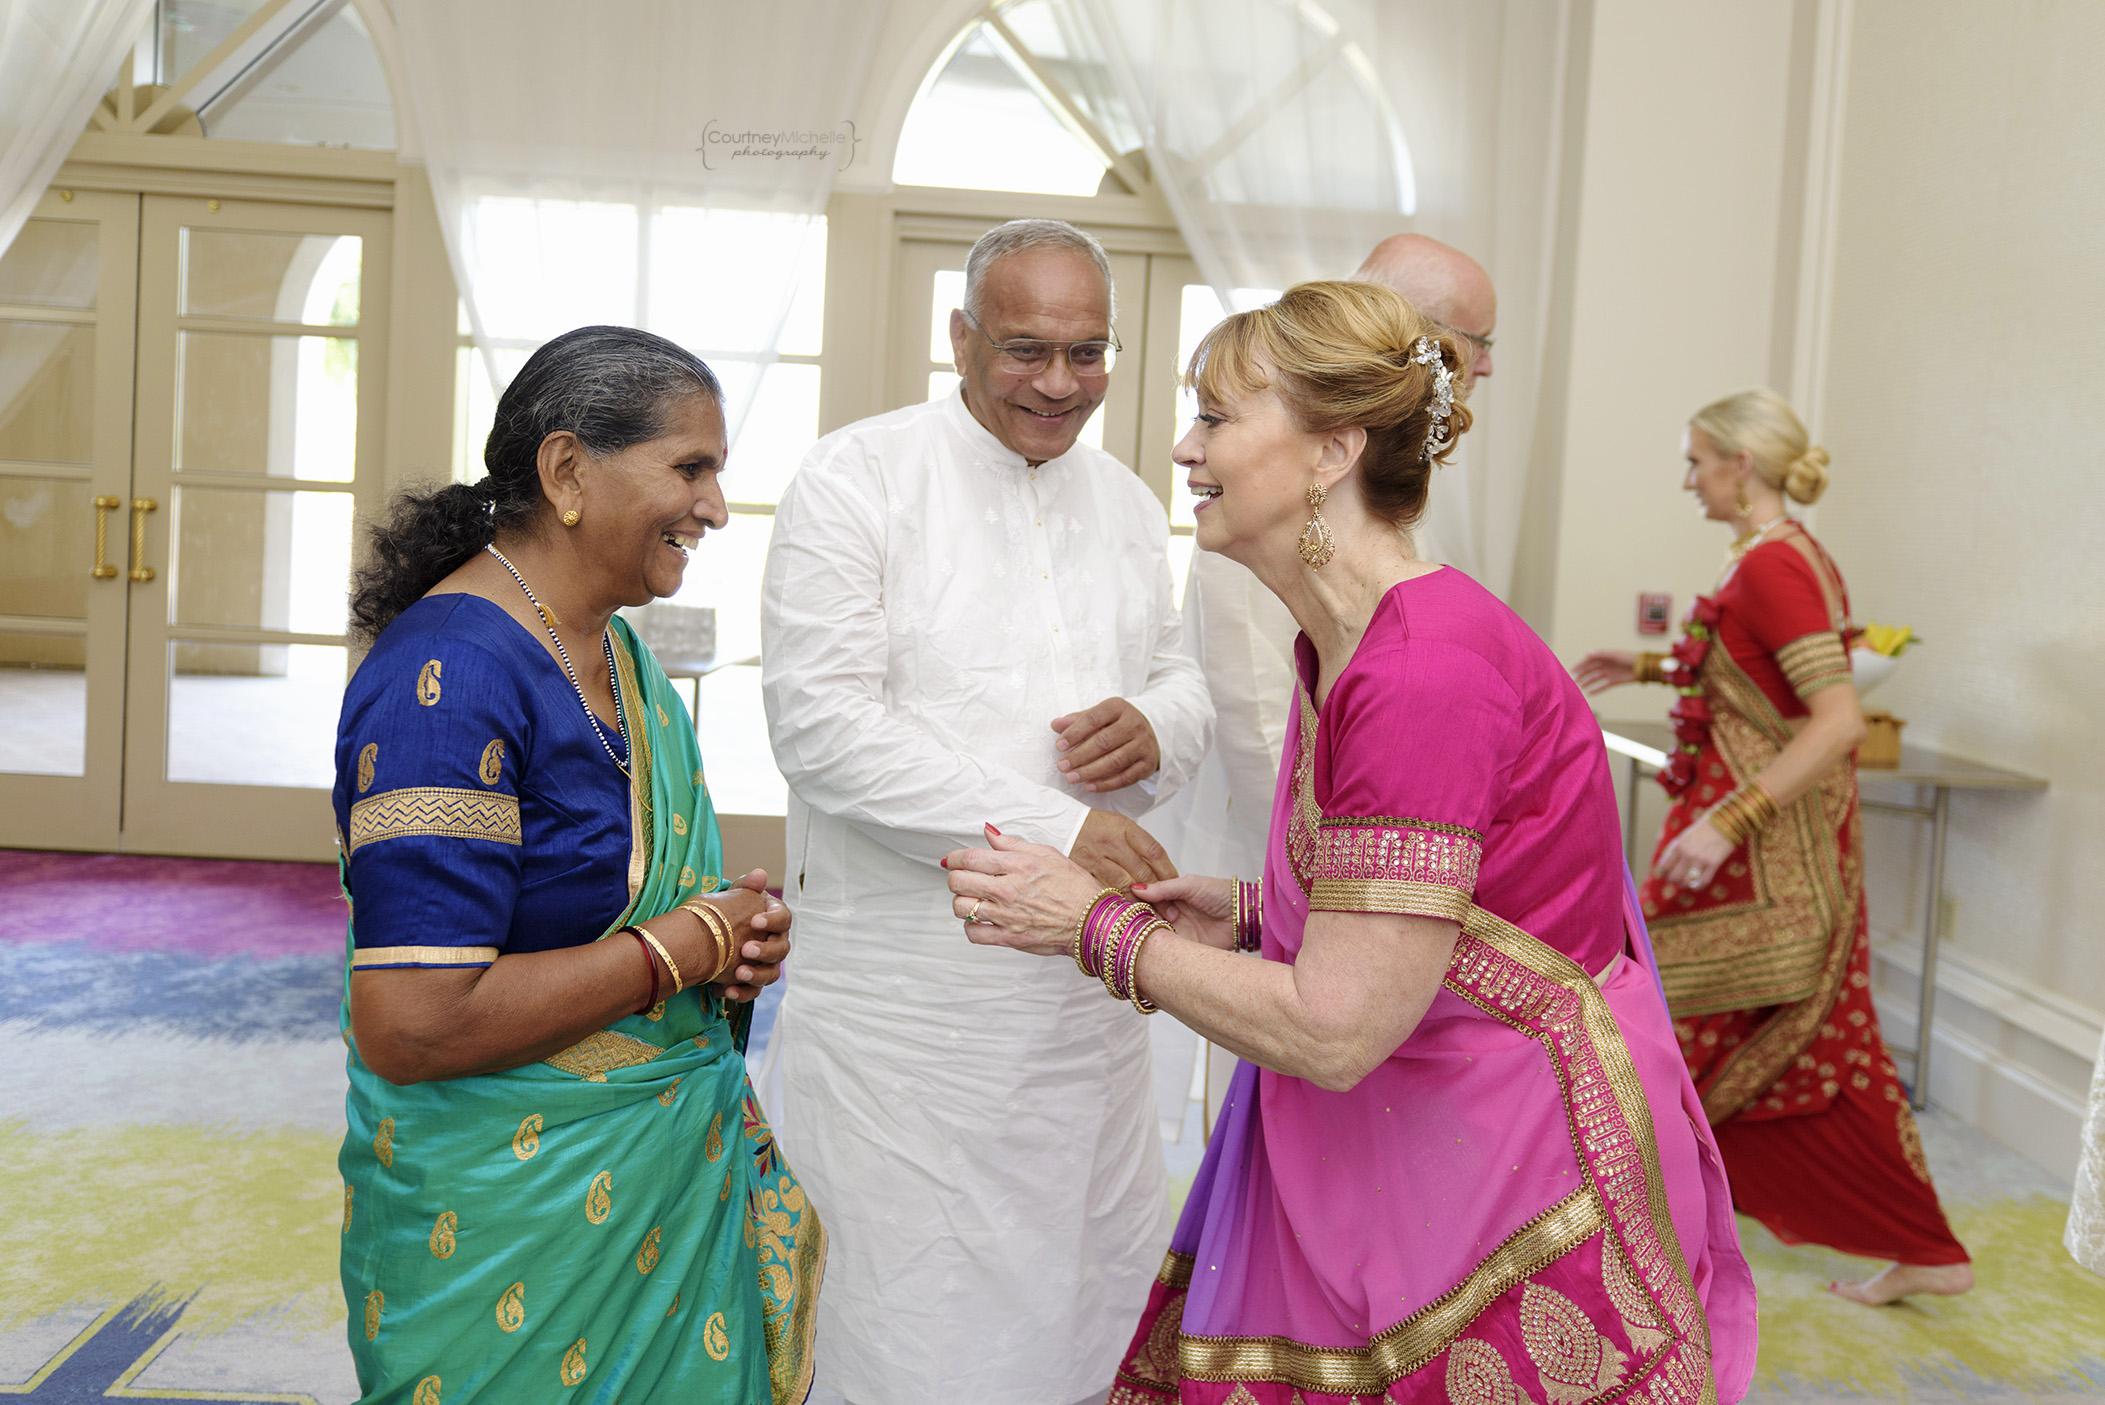 hindu-ceremony-grand-cayman-ritz-carlton-wedding©CopyrightCMP-LeaAnneRaj-7253.jpg